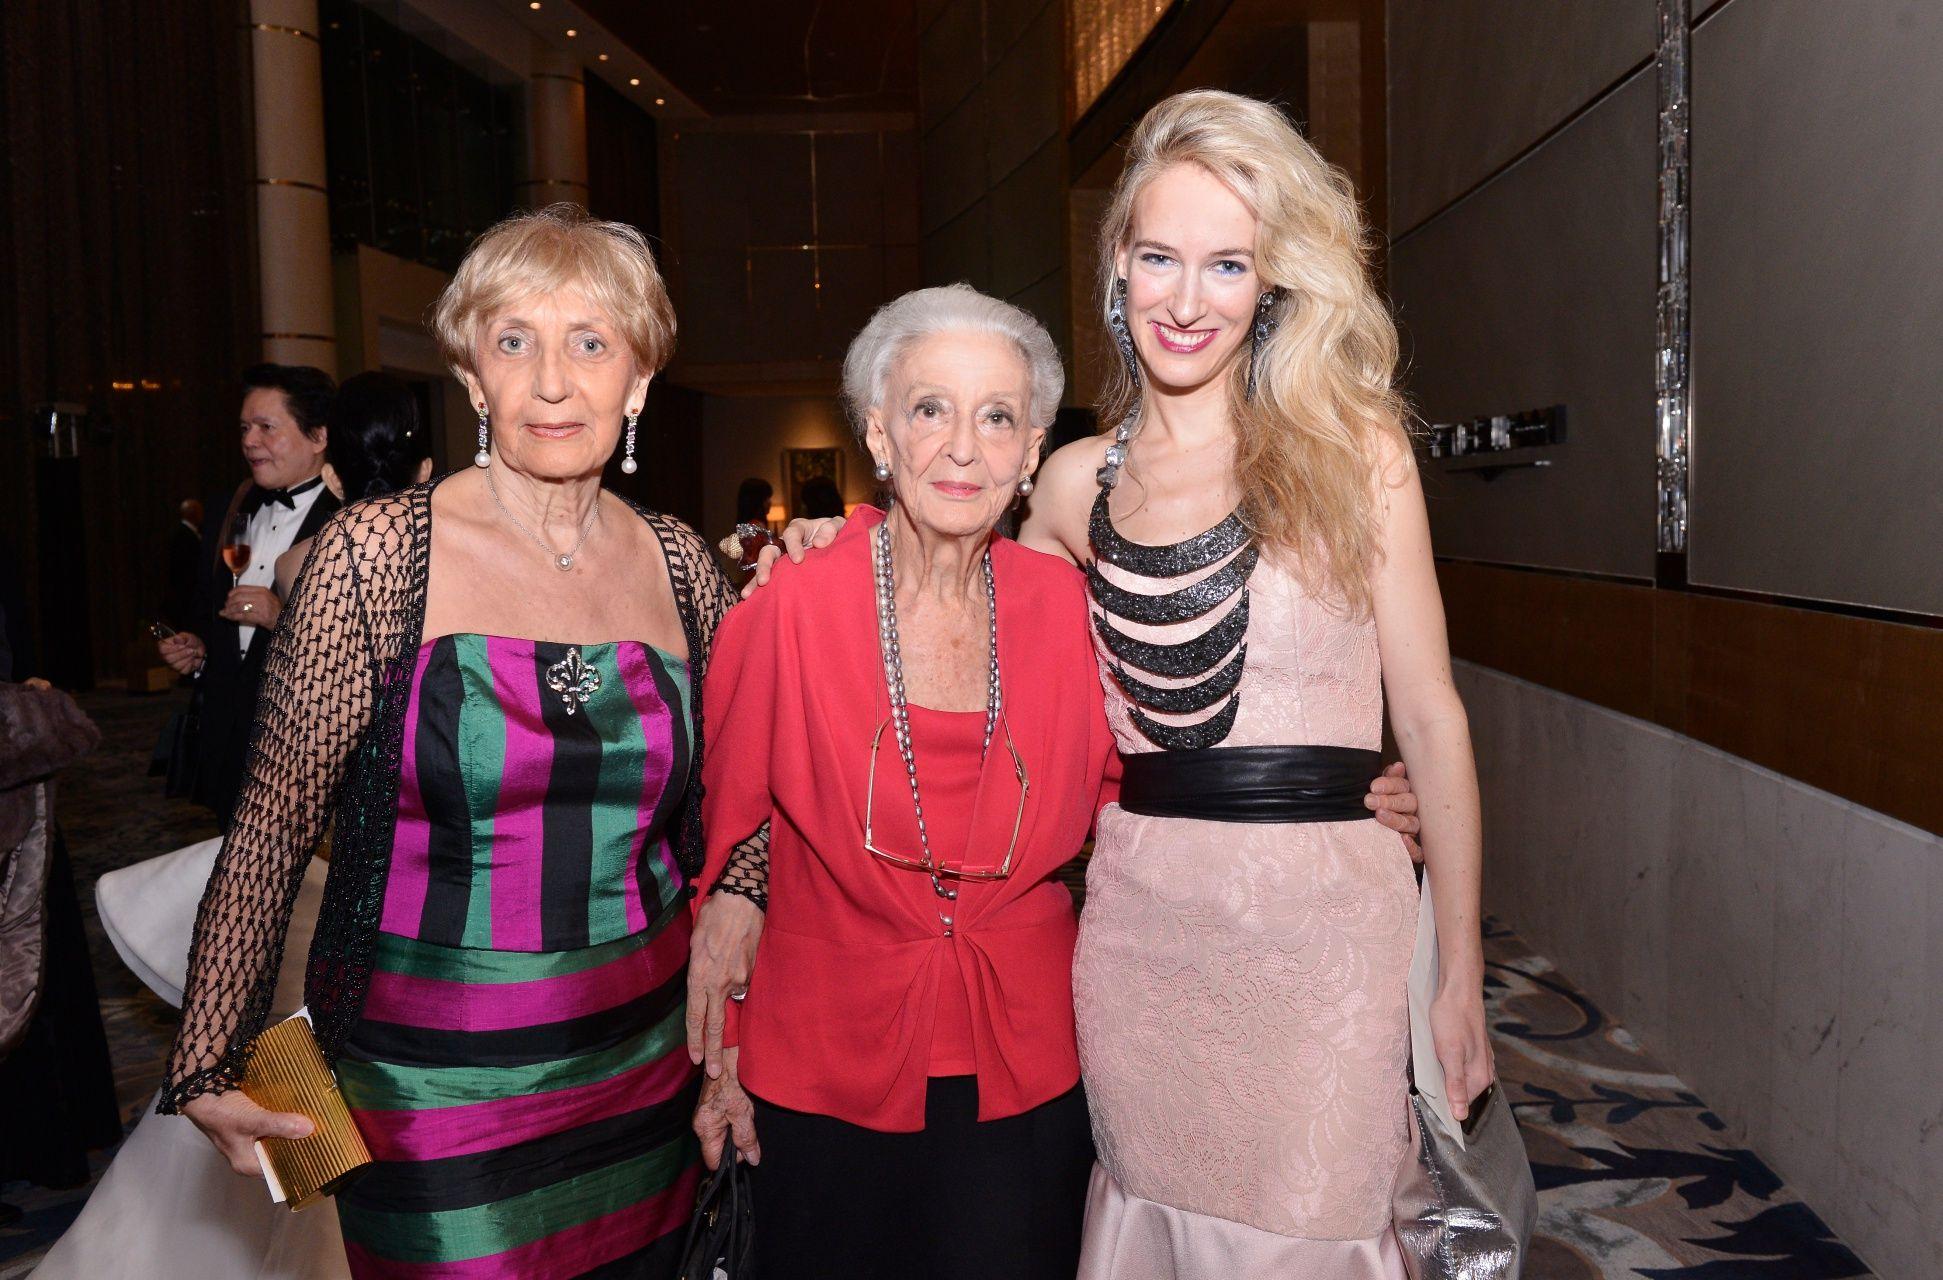 Elena Colome, Betsy Westendorp and Cristina Grisar